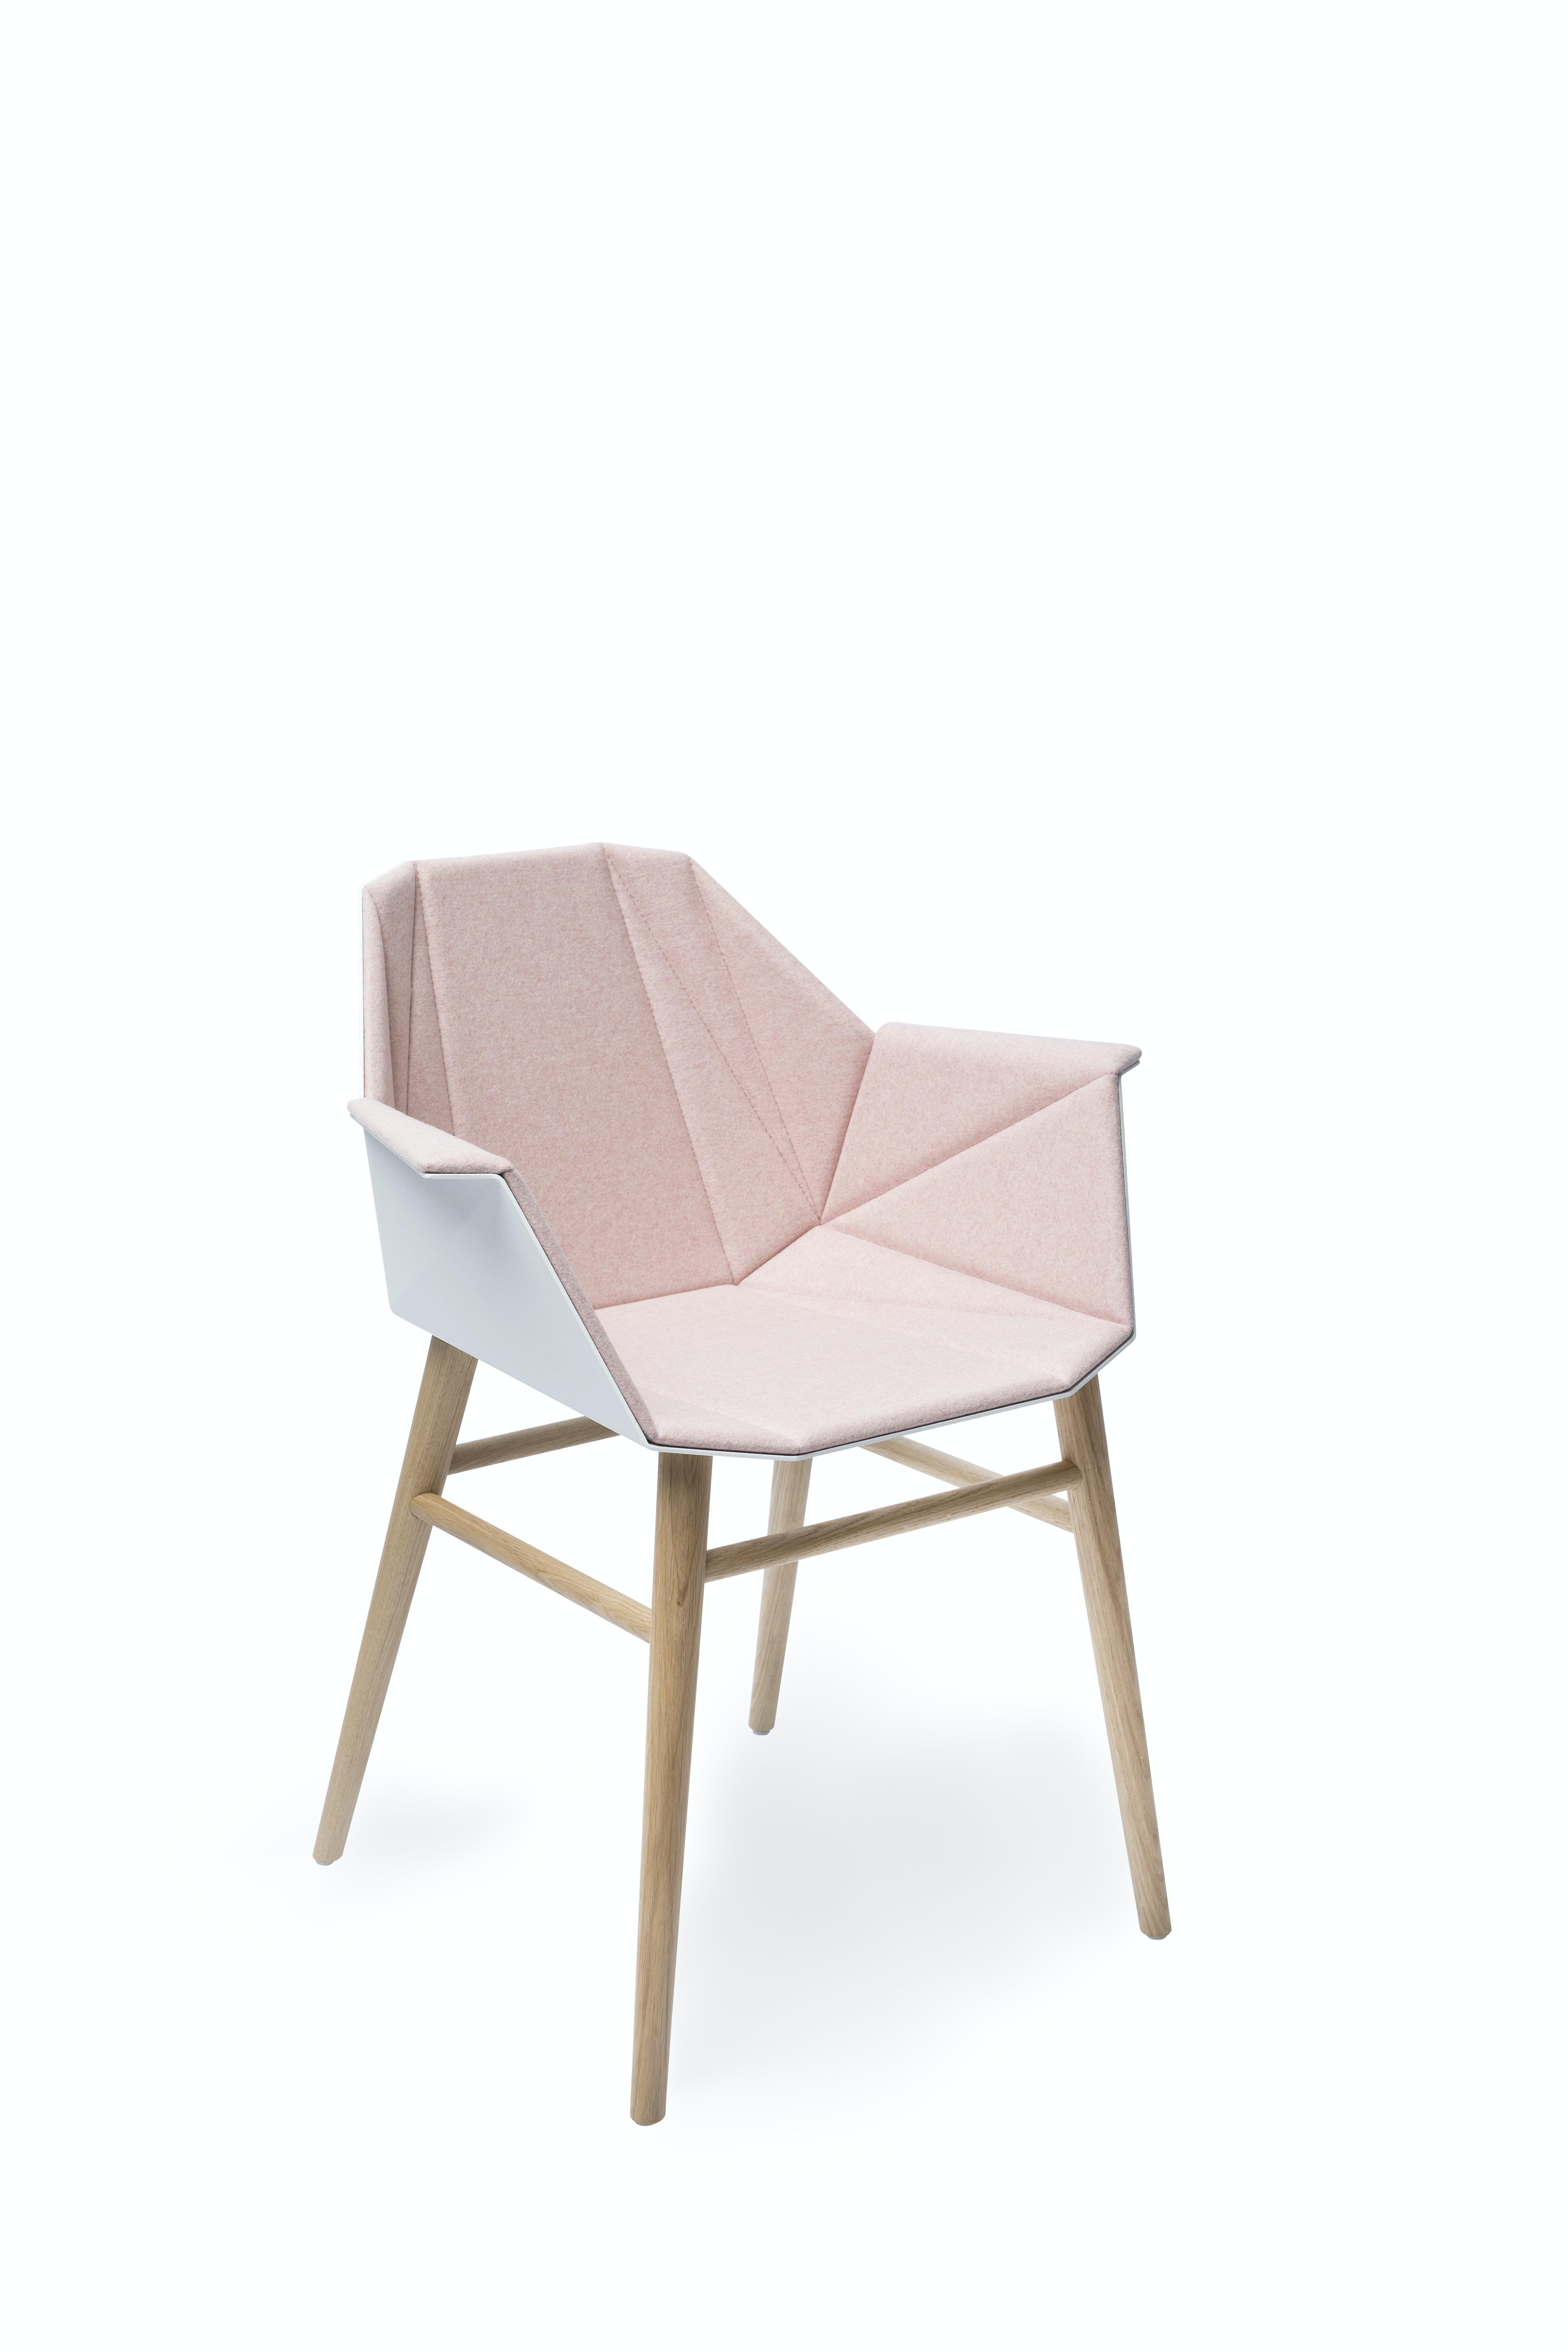 Alumni Wood White Pink Upholstered Side Angle